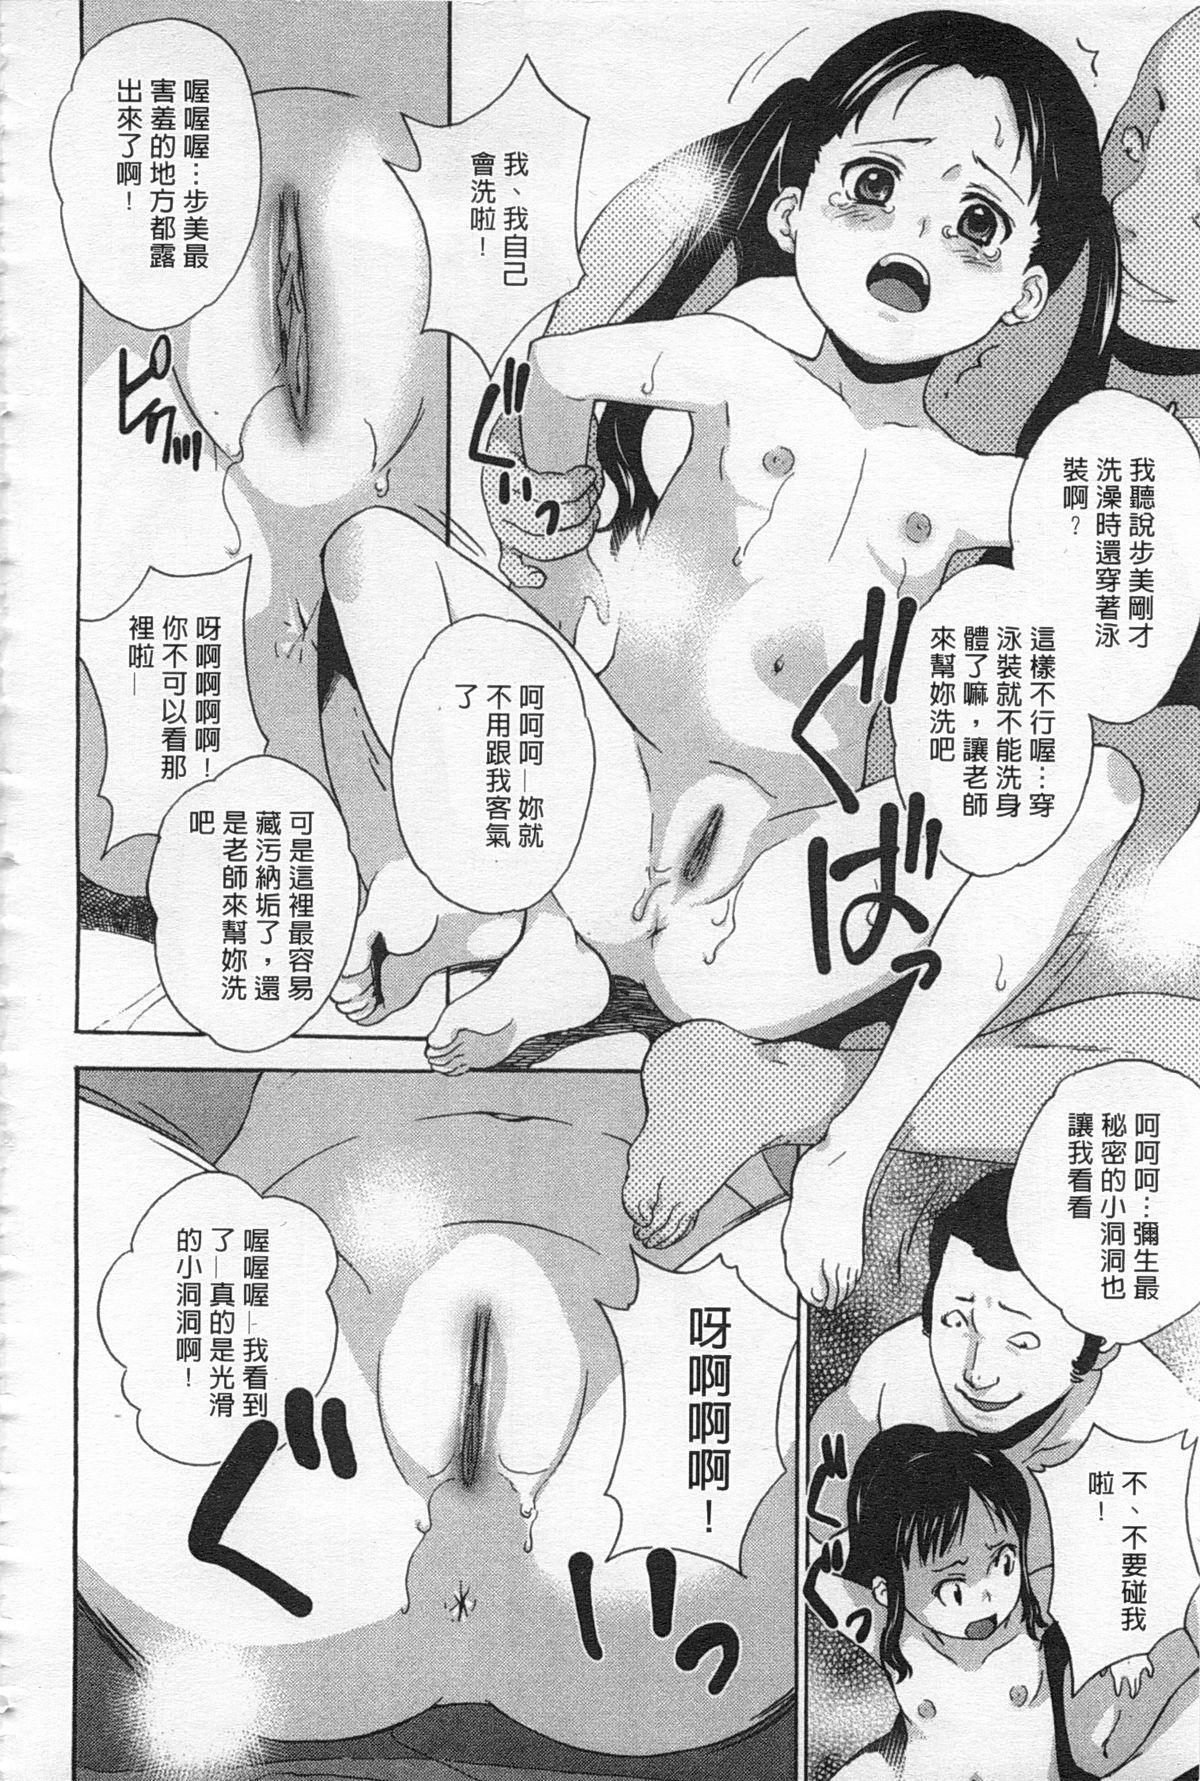 Zetsubou Rinkan Gakkou 12